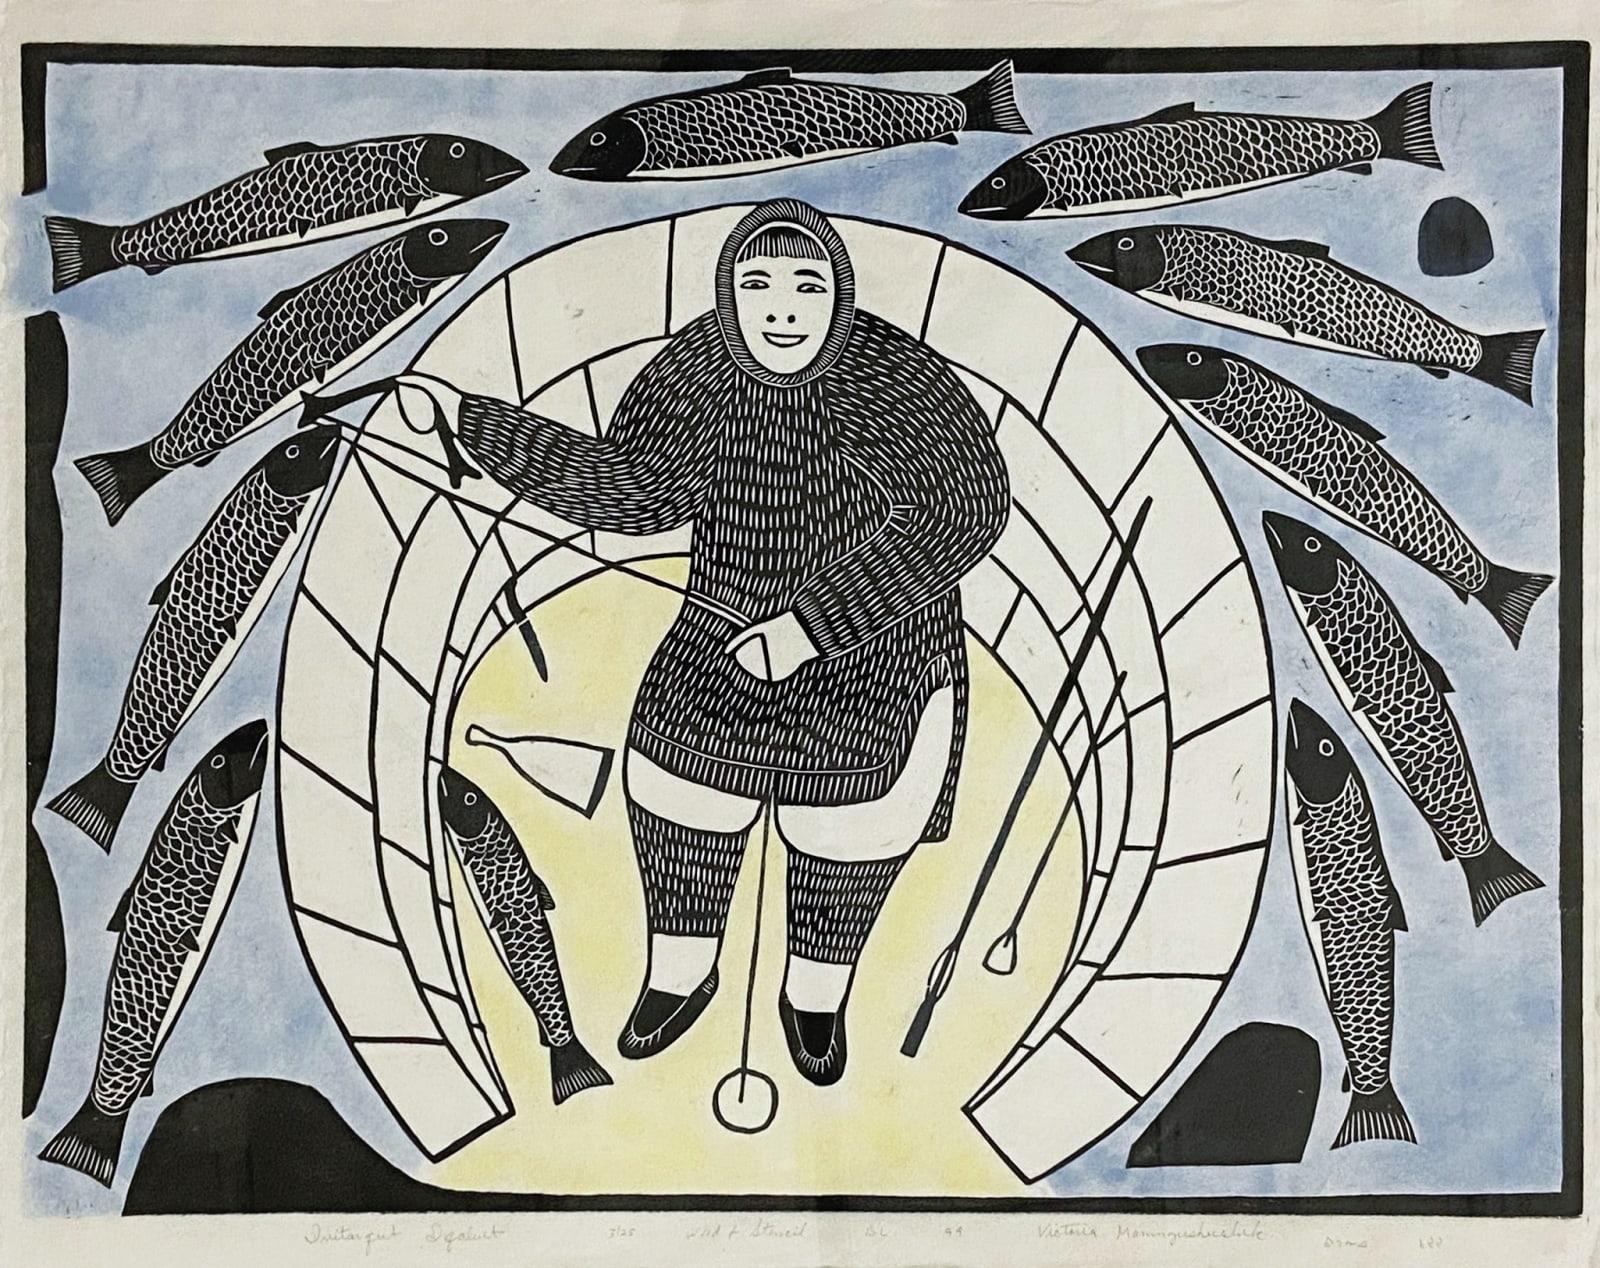 LOT 64 VICTORIA MAMNGUQSUALUK (1930-2016) QAMANI'TUAQ (BAKER LAKE) Ivitarqut Iqaluit, 1999 woodcut and stencil, 17 3/4 x 24 in (45.1 x 61 cm) ESTIMATE: $400 — $600